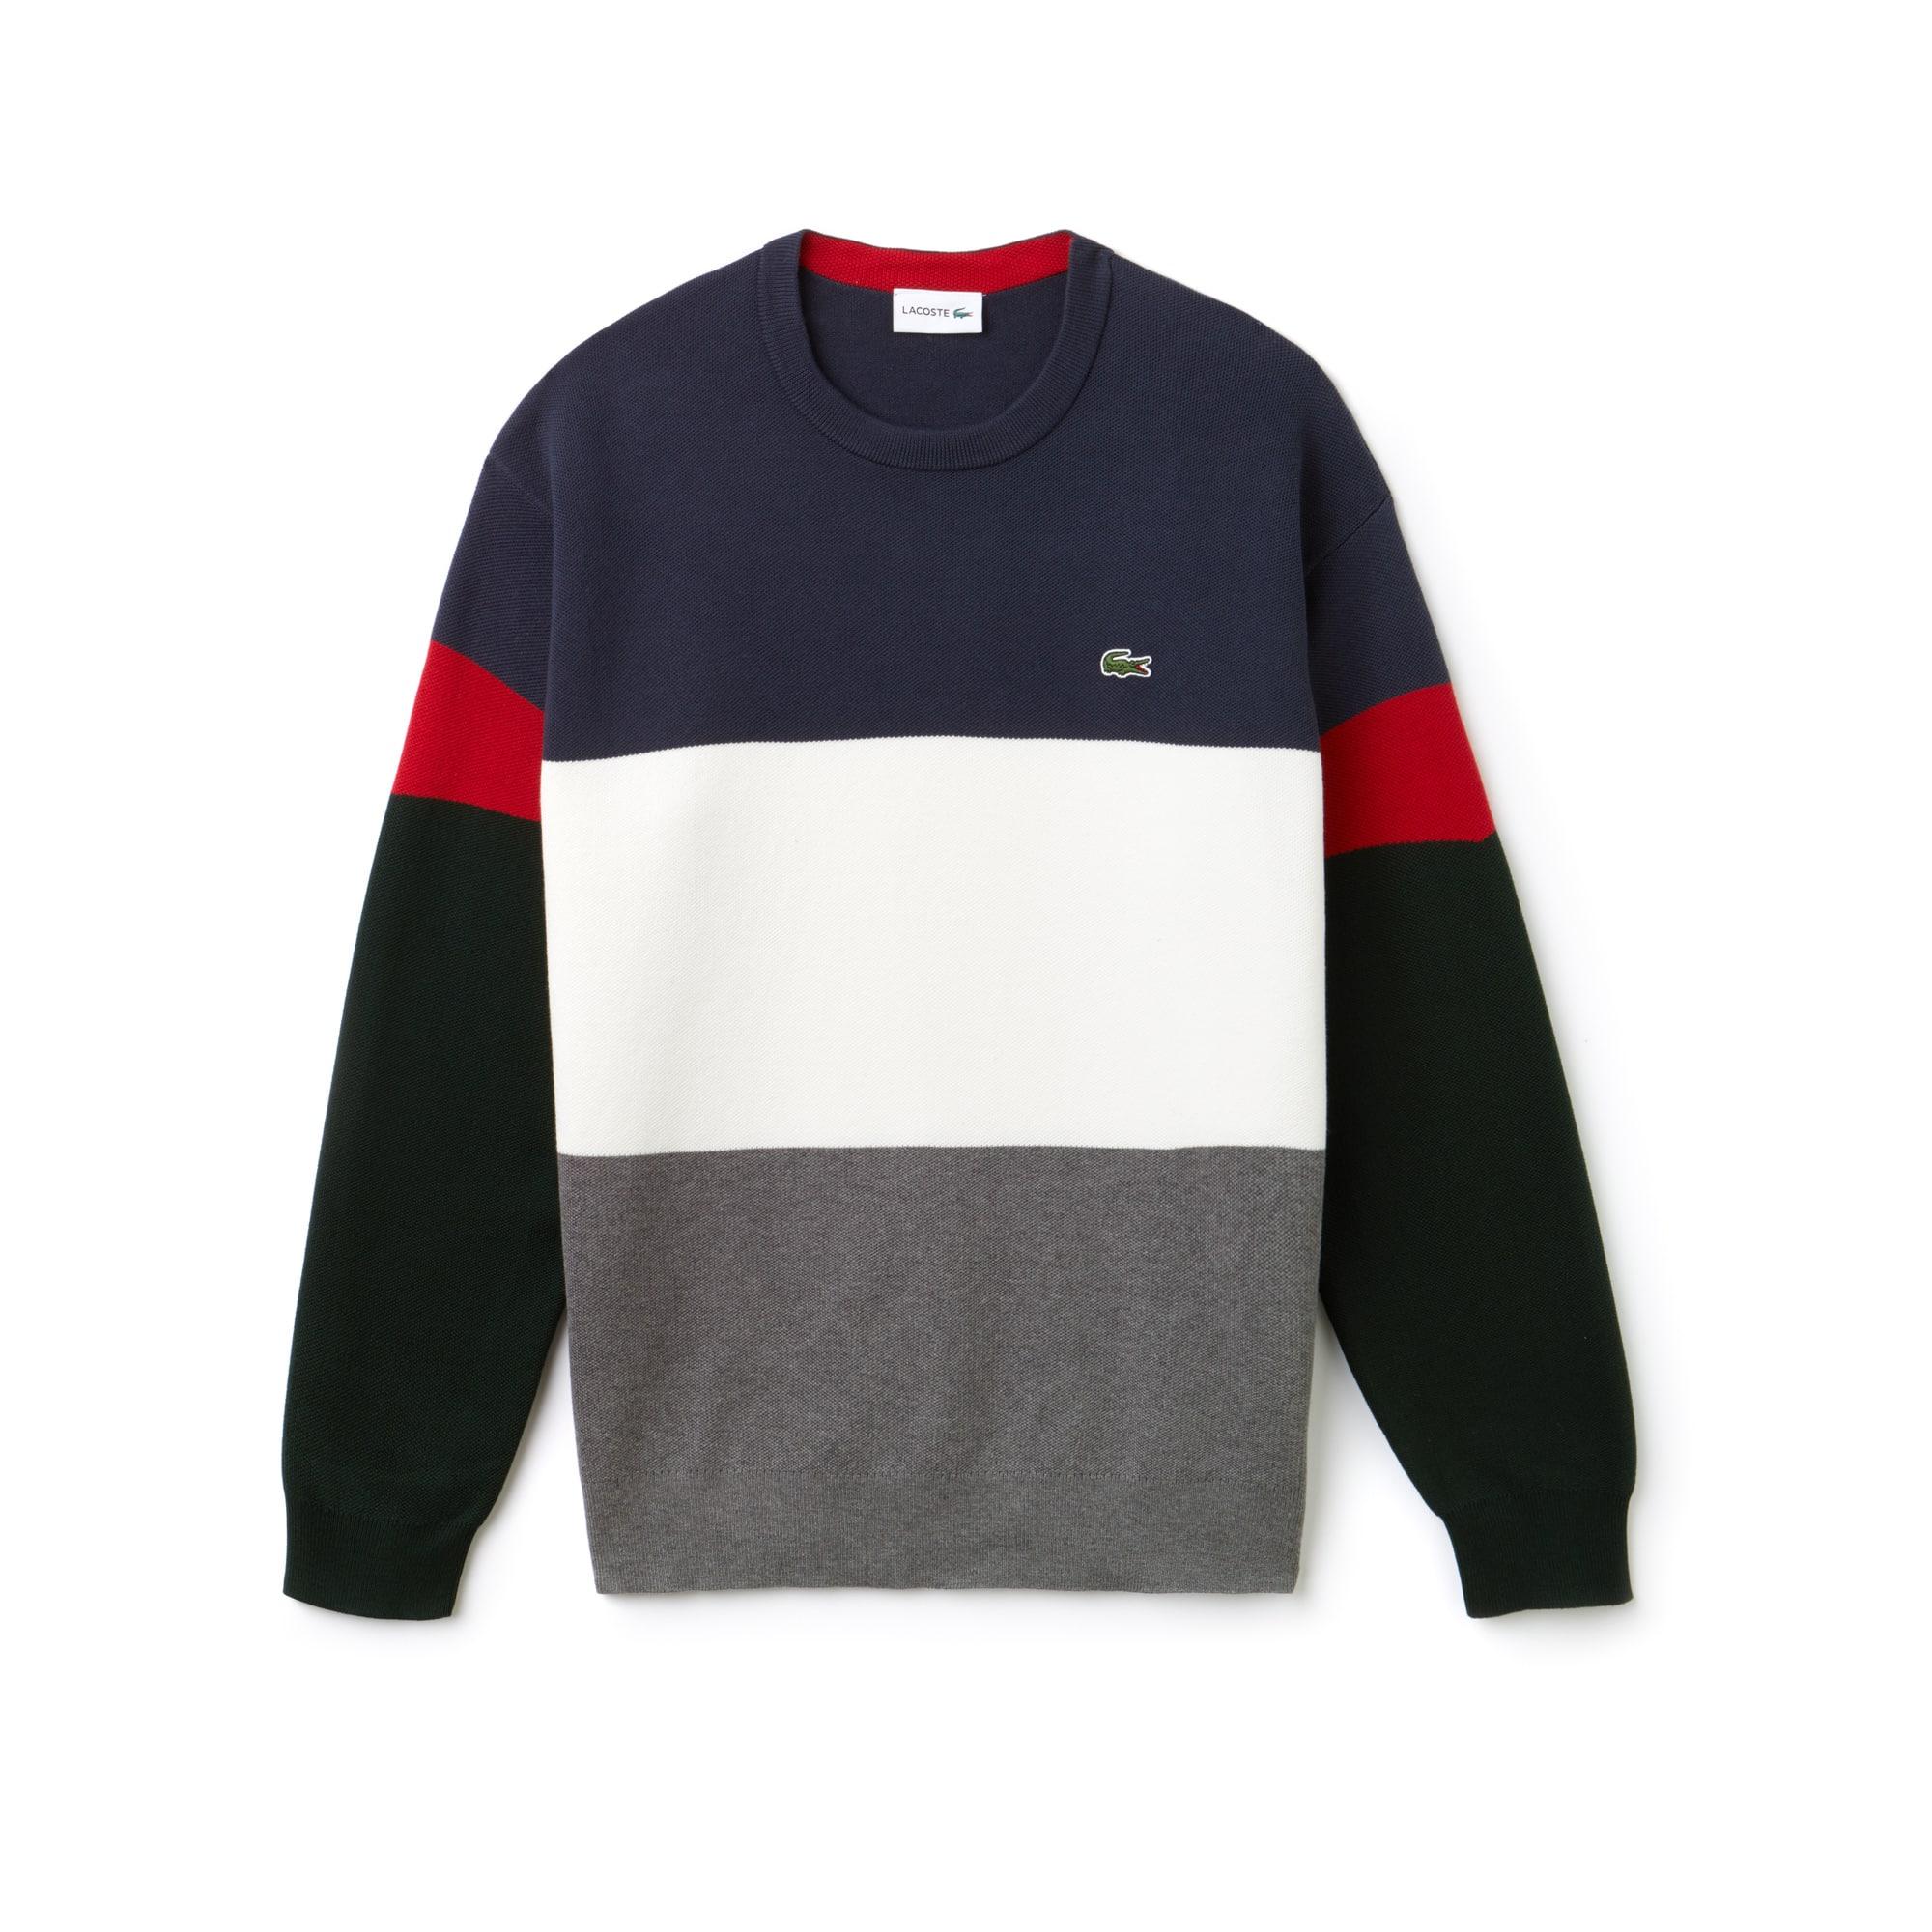 Men's Crew Neck Colorblock Flat Ribbed Cotton Sweater